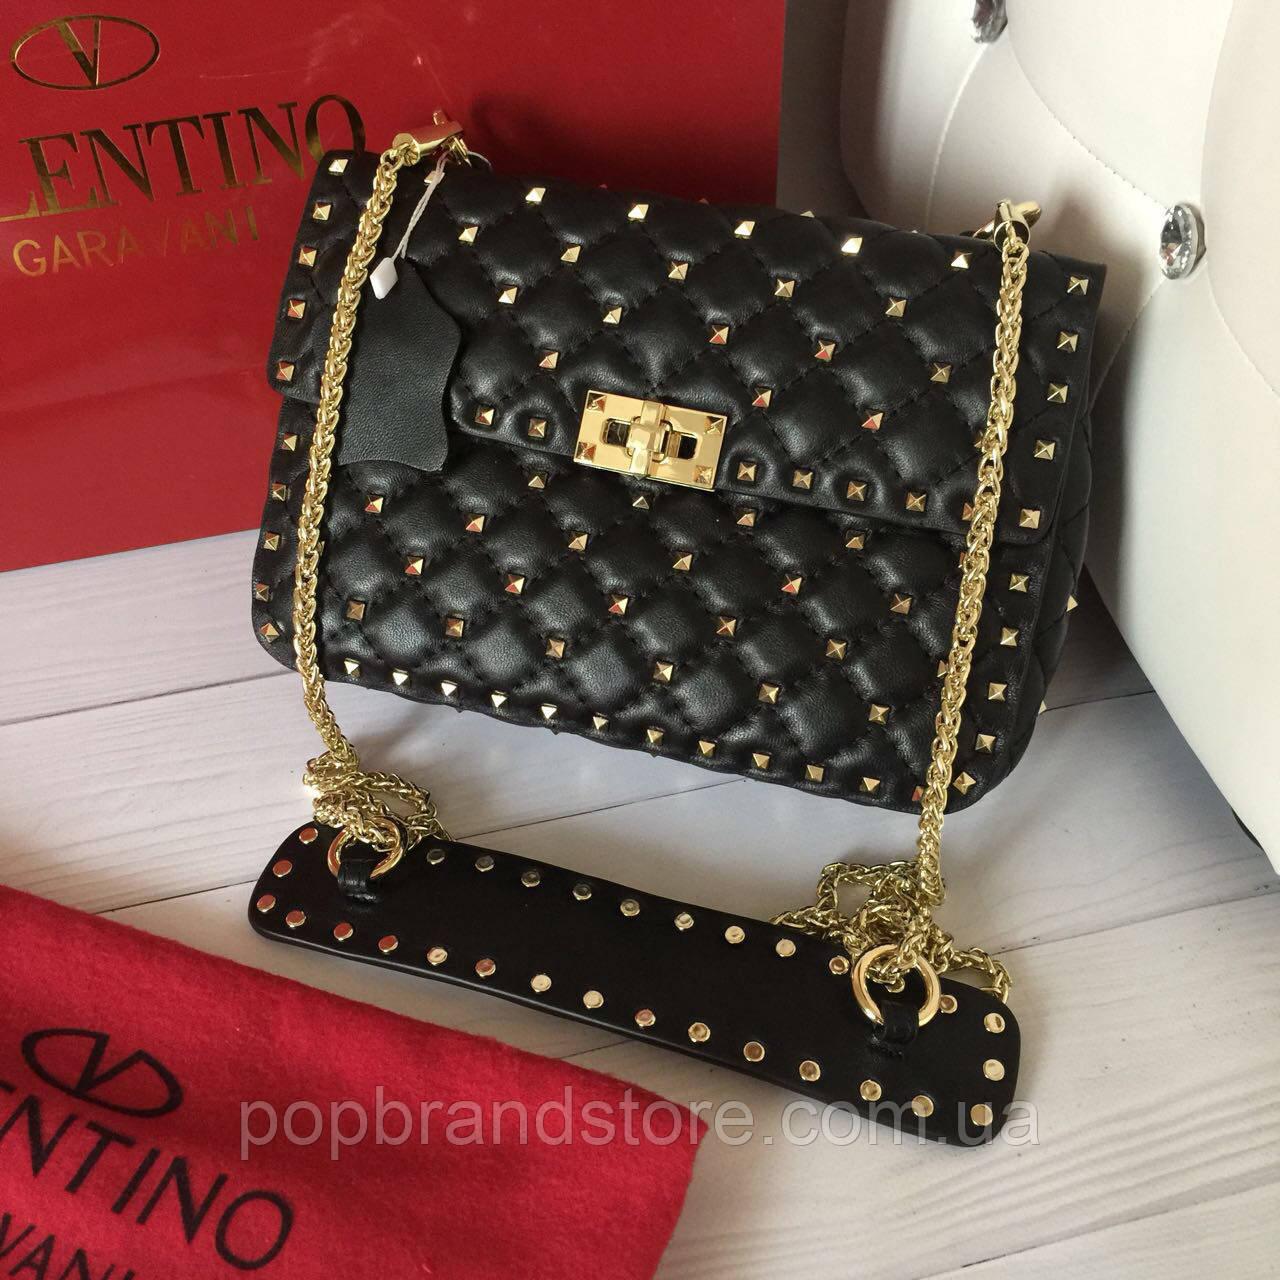 7d7bd1c2c42d Женская сумочка Valentino Garavani Rockstud (реплика) - Pop Brand Store    брендовые сумки,